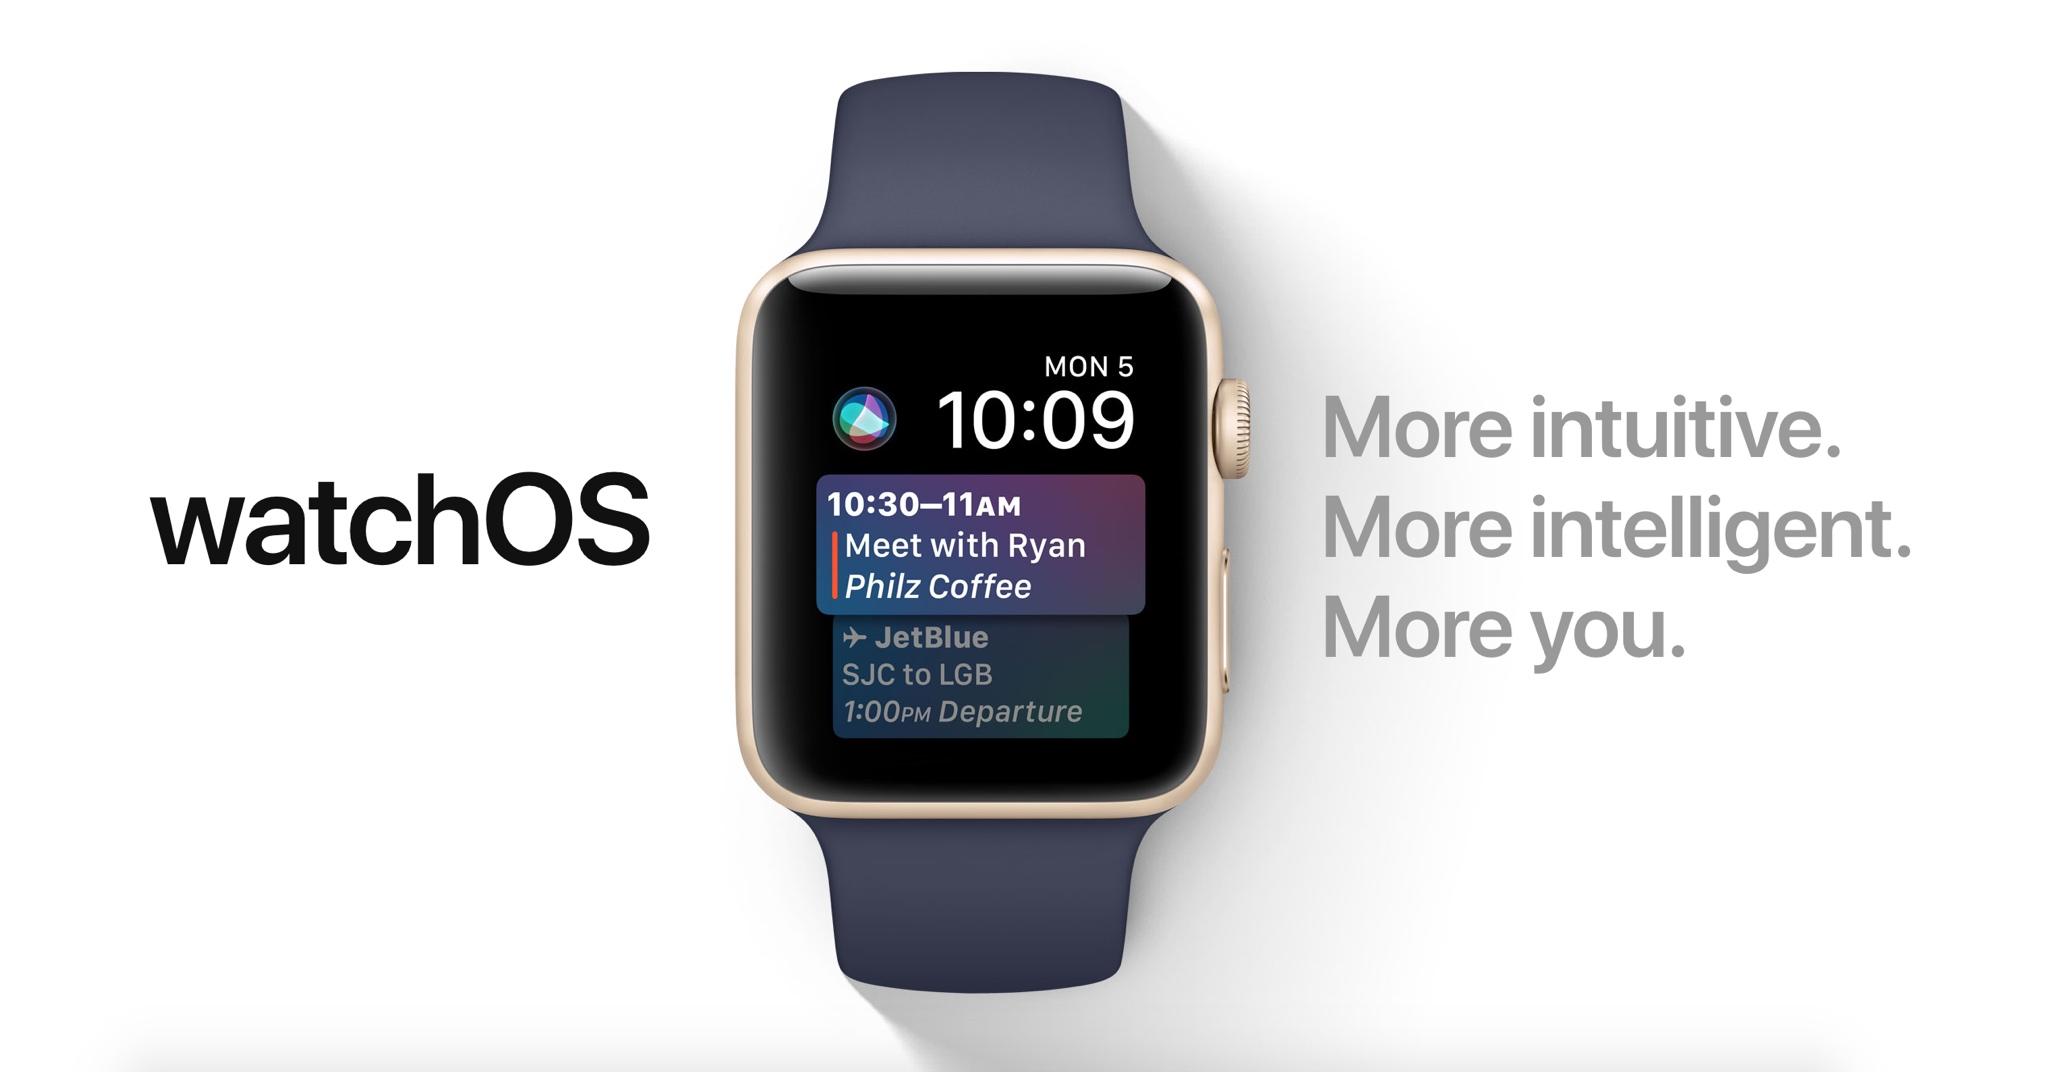 Apple seeds watchOS 4 beta 2 to developers